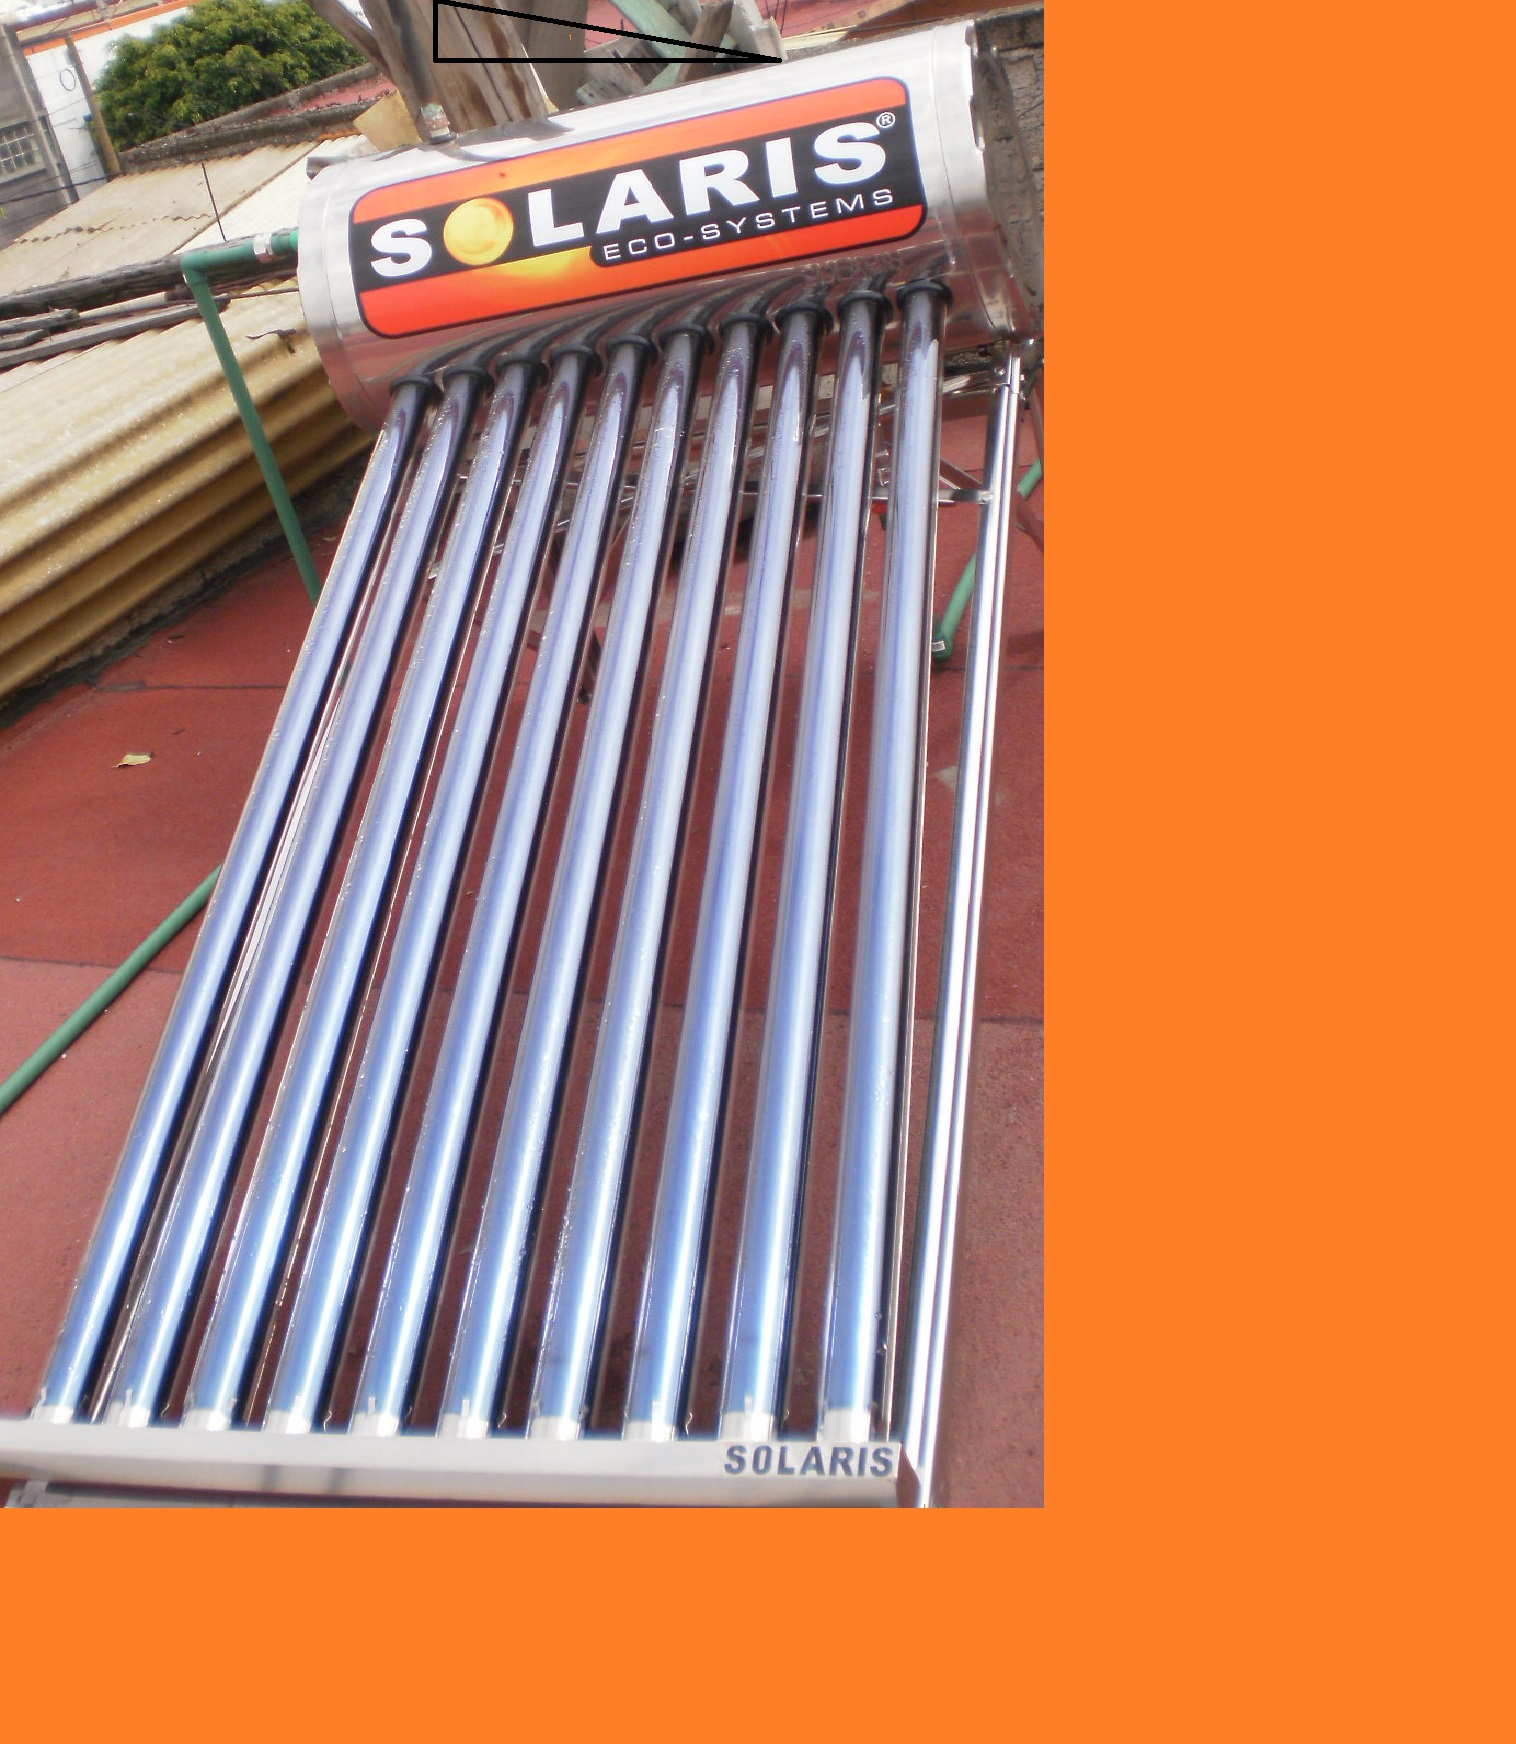 Tolentino´s Energy Tolmev Solar Eolica Voltaika